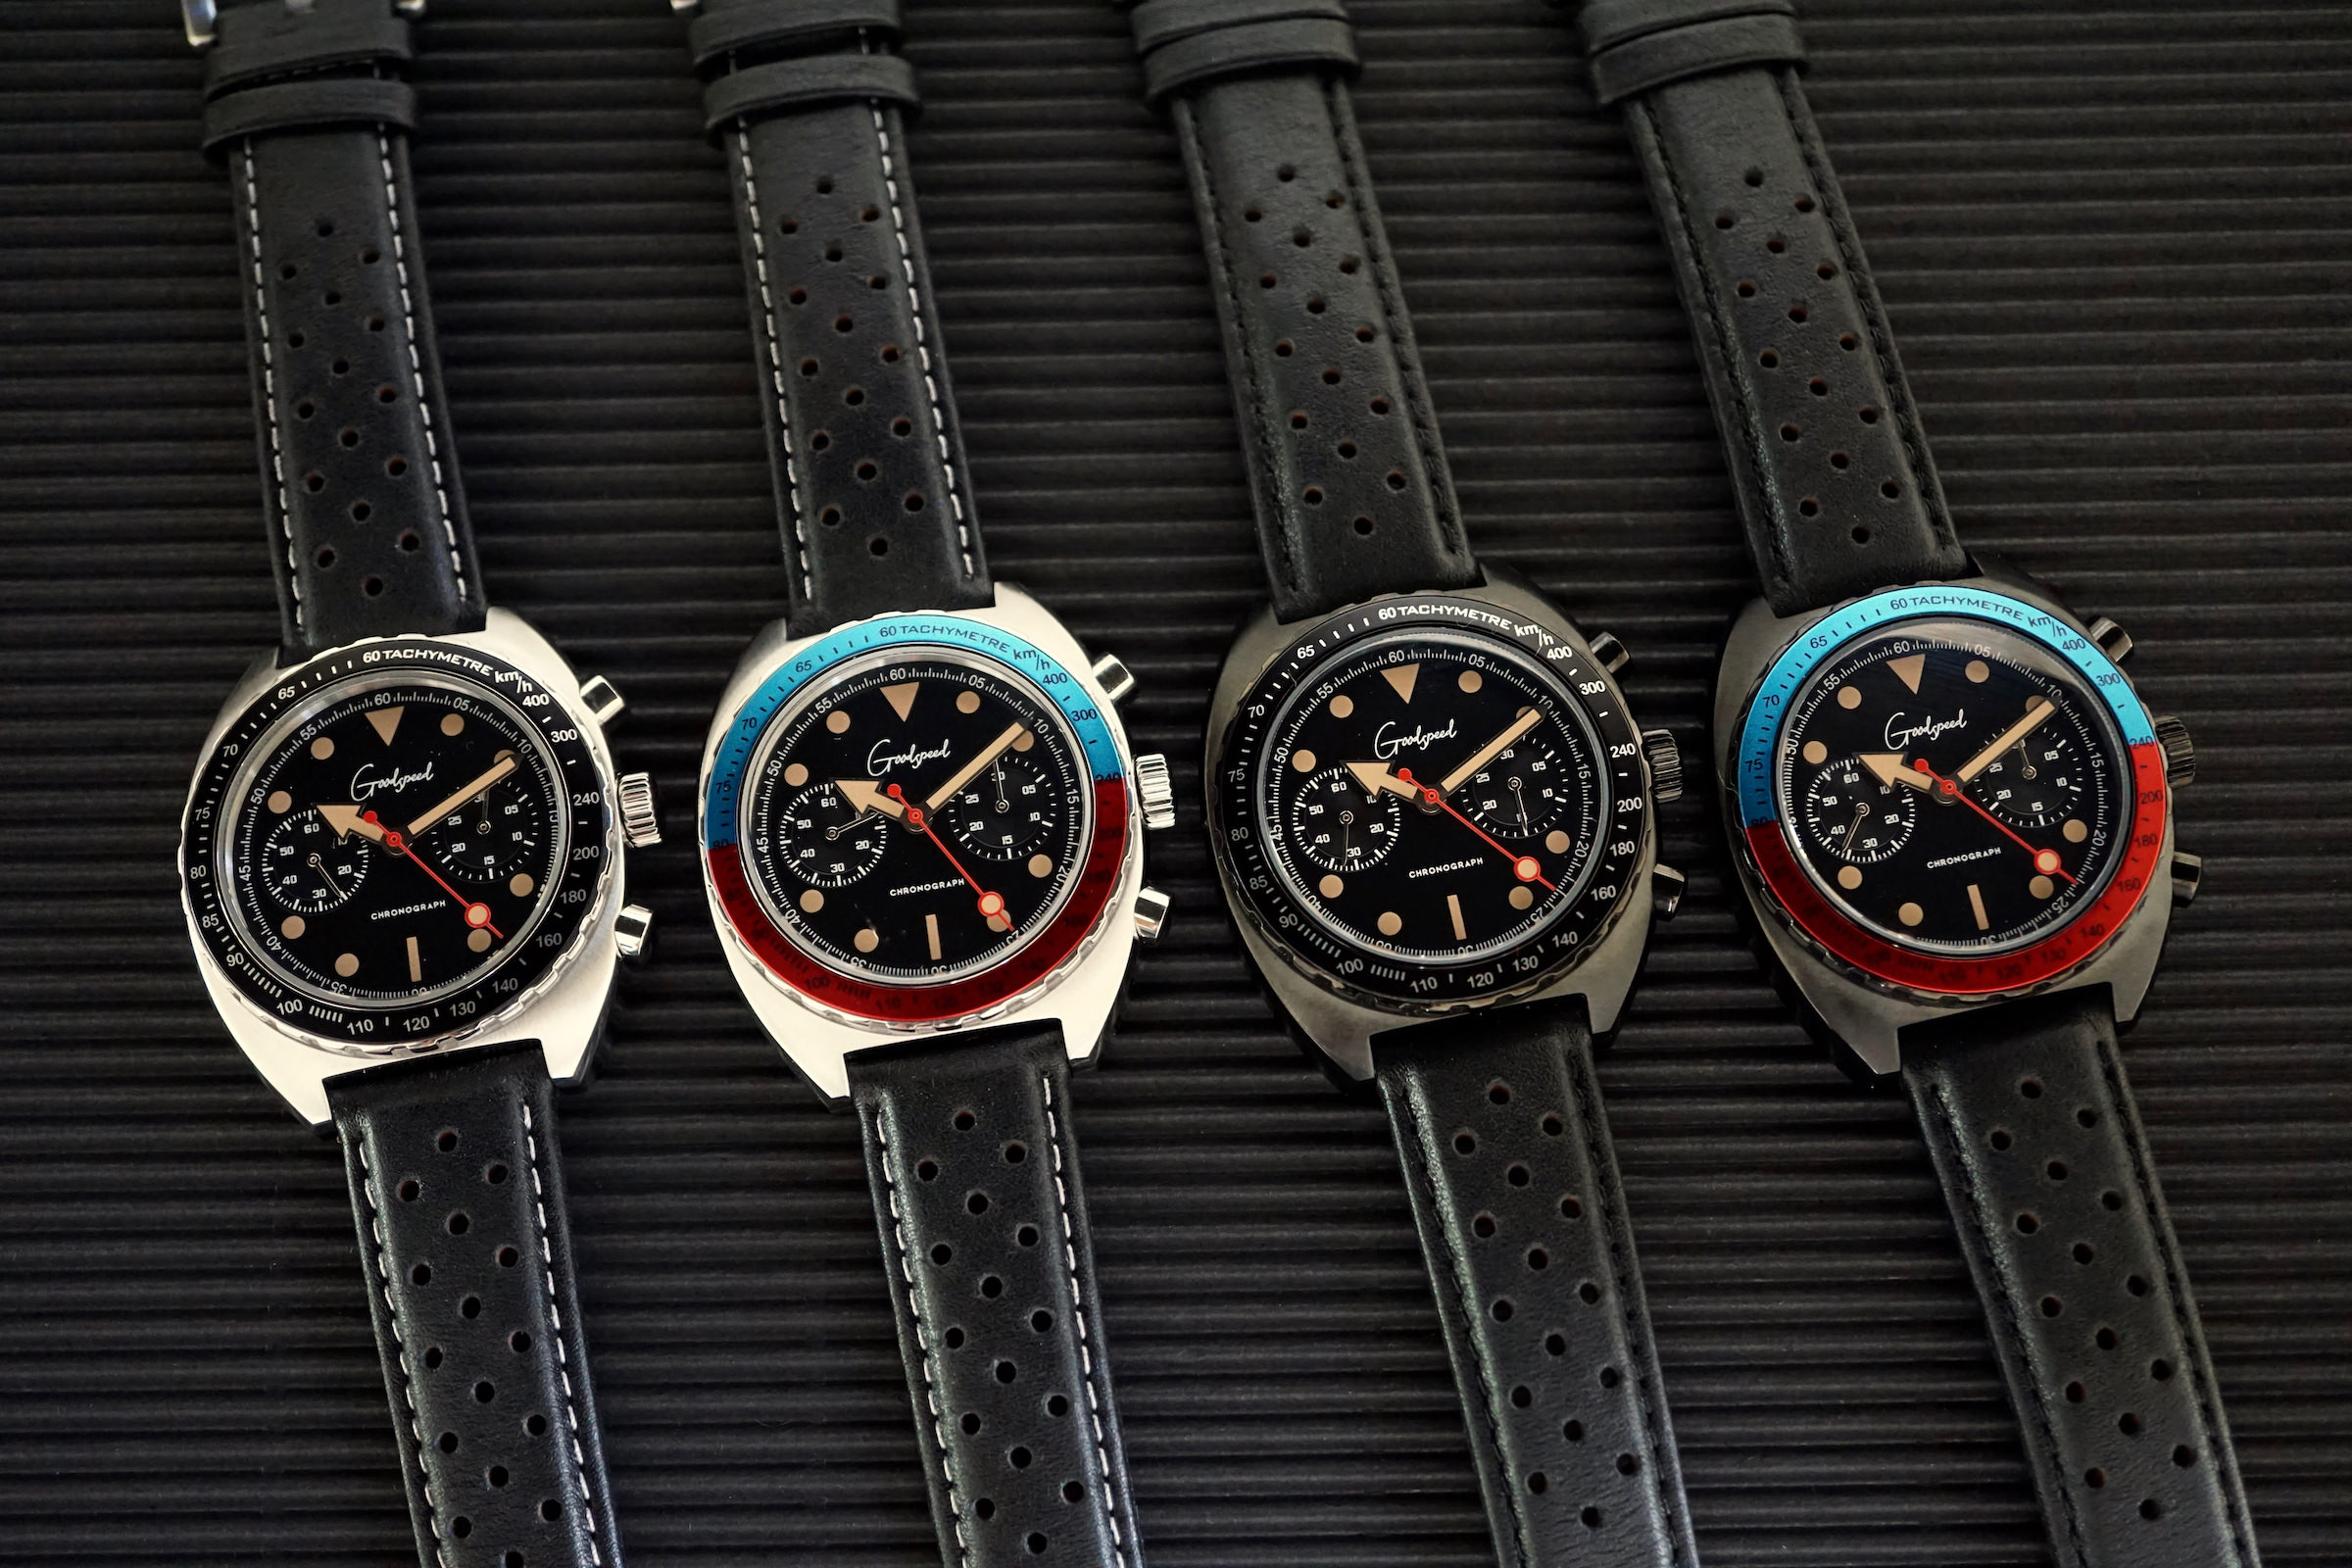 Goodspeed Sonoma Watches